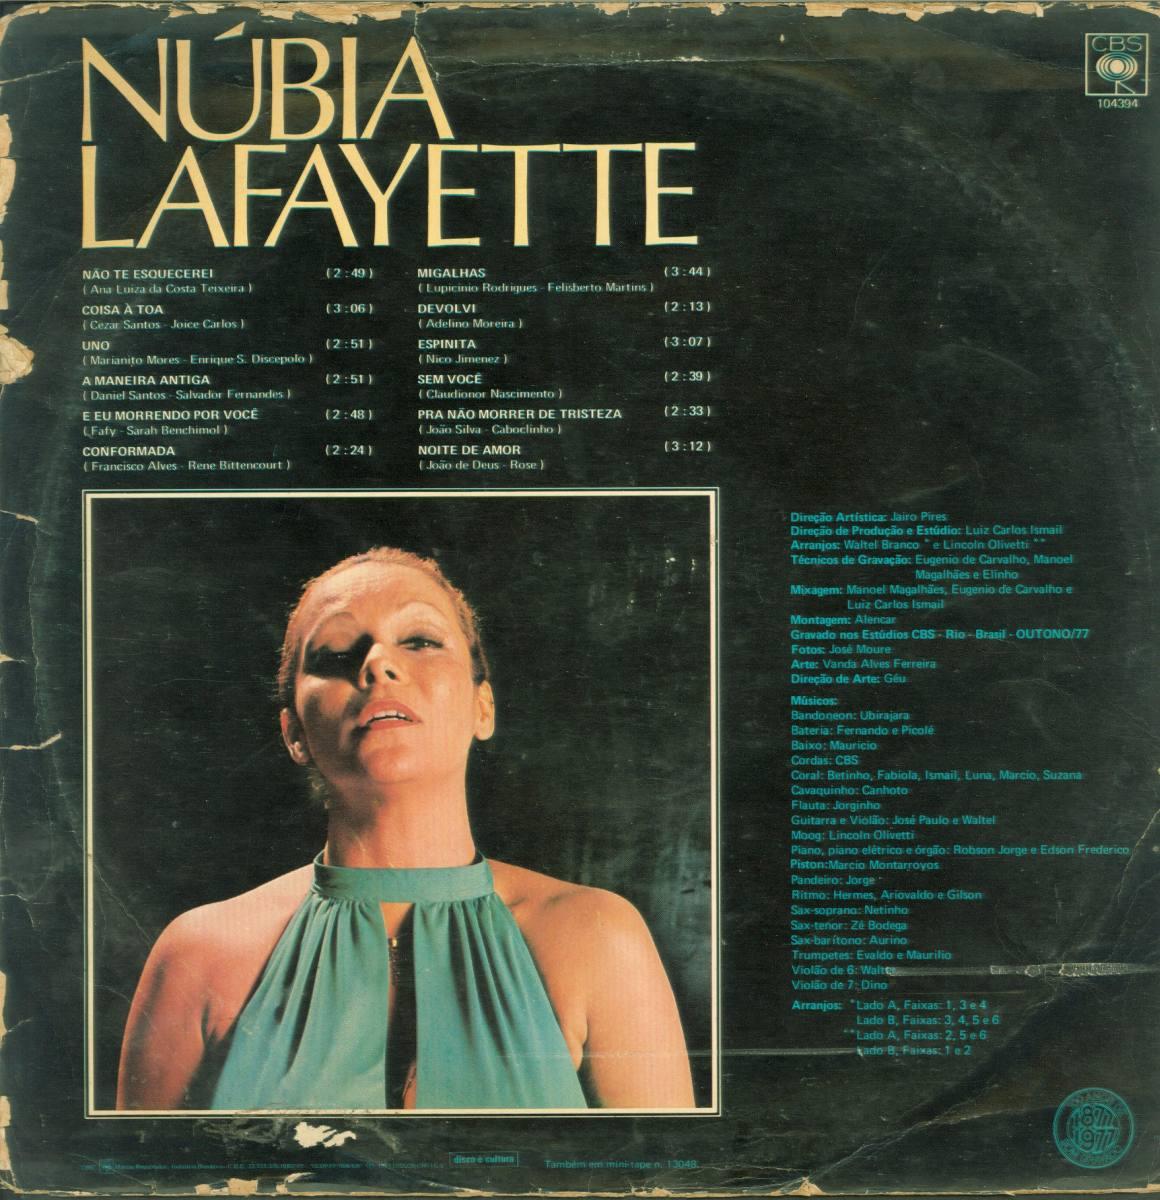 Lp nubia lafayette n o te esquecerei 1977 cbs r for Lafayette cds 30